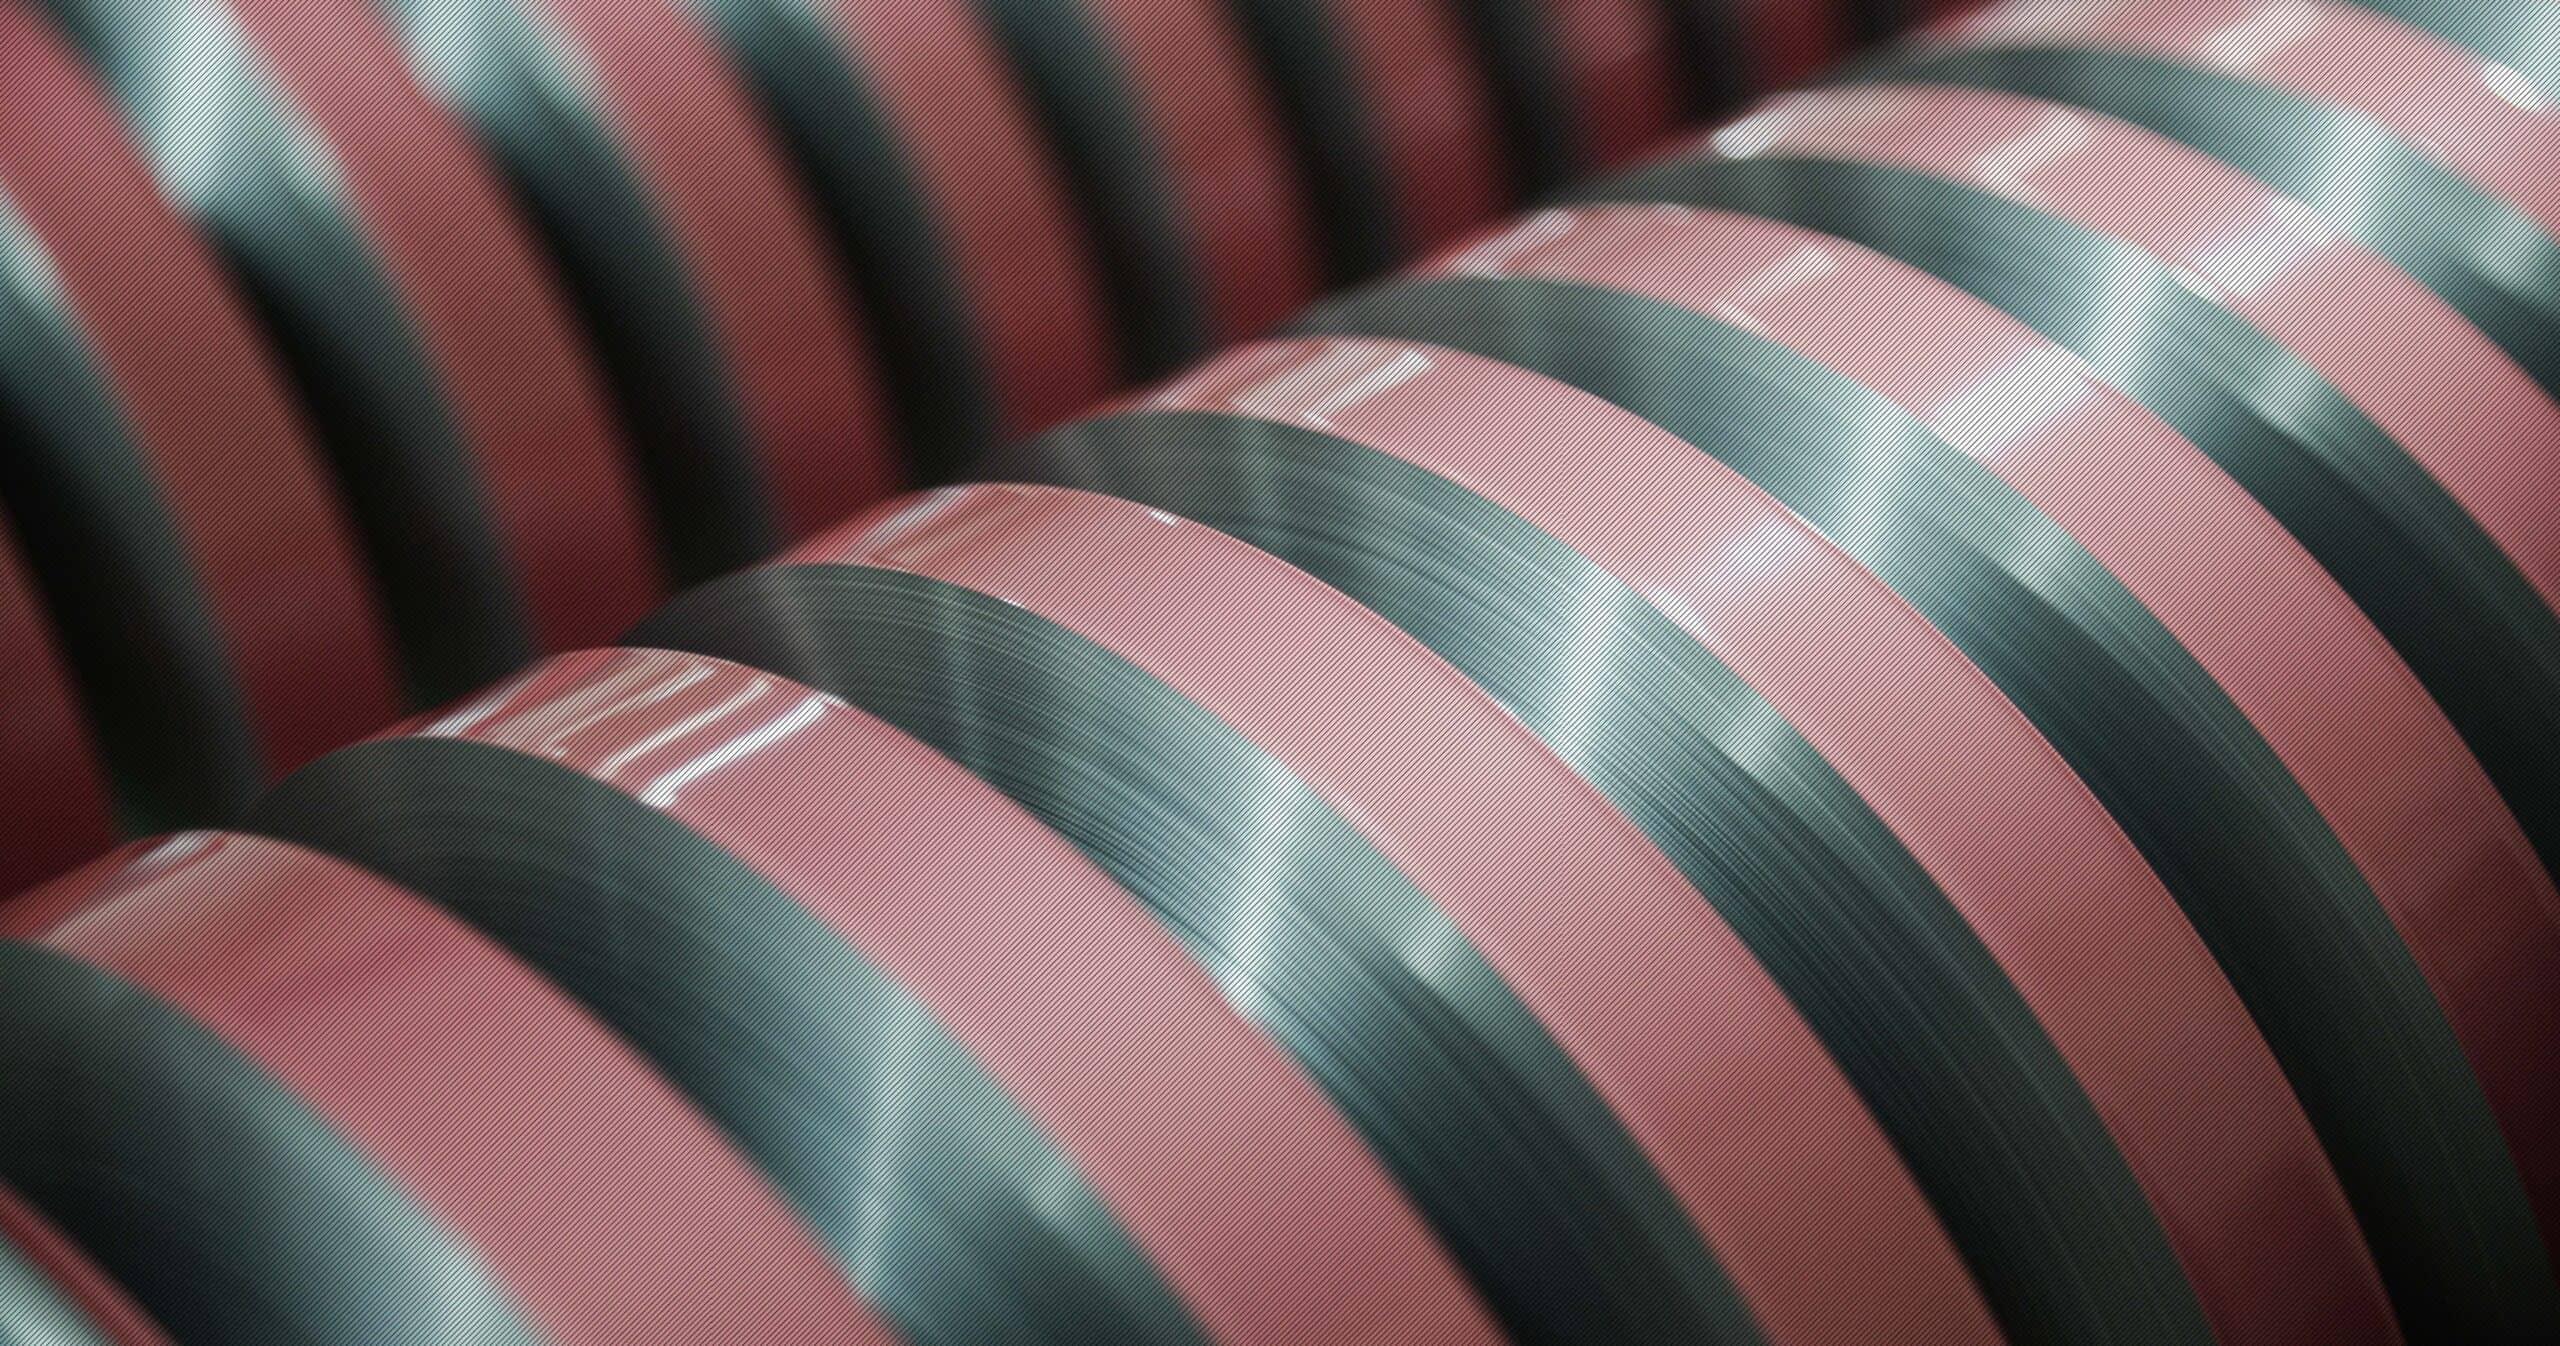 Aluminium Foil / Bondable Film Tape